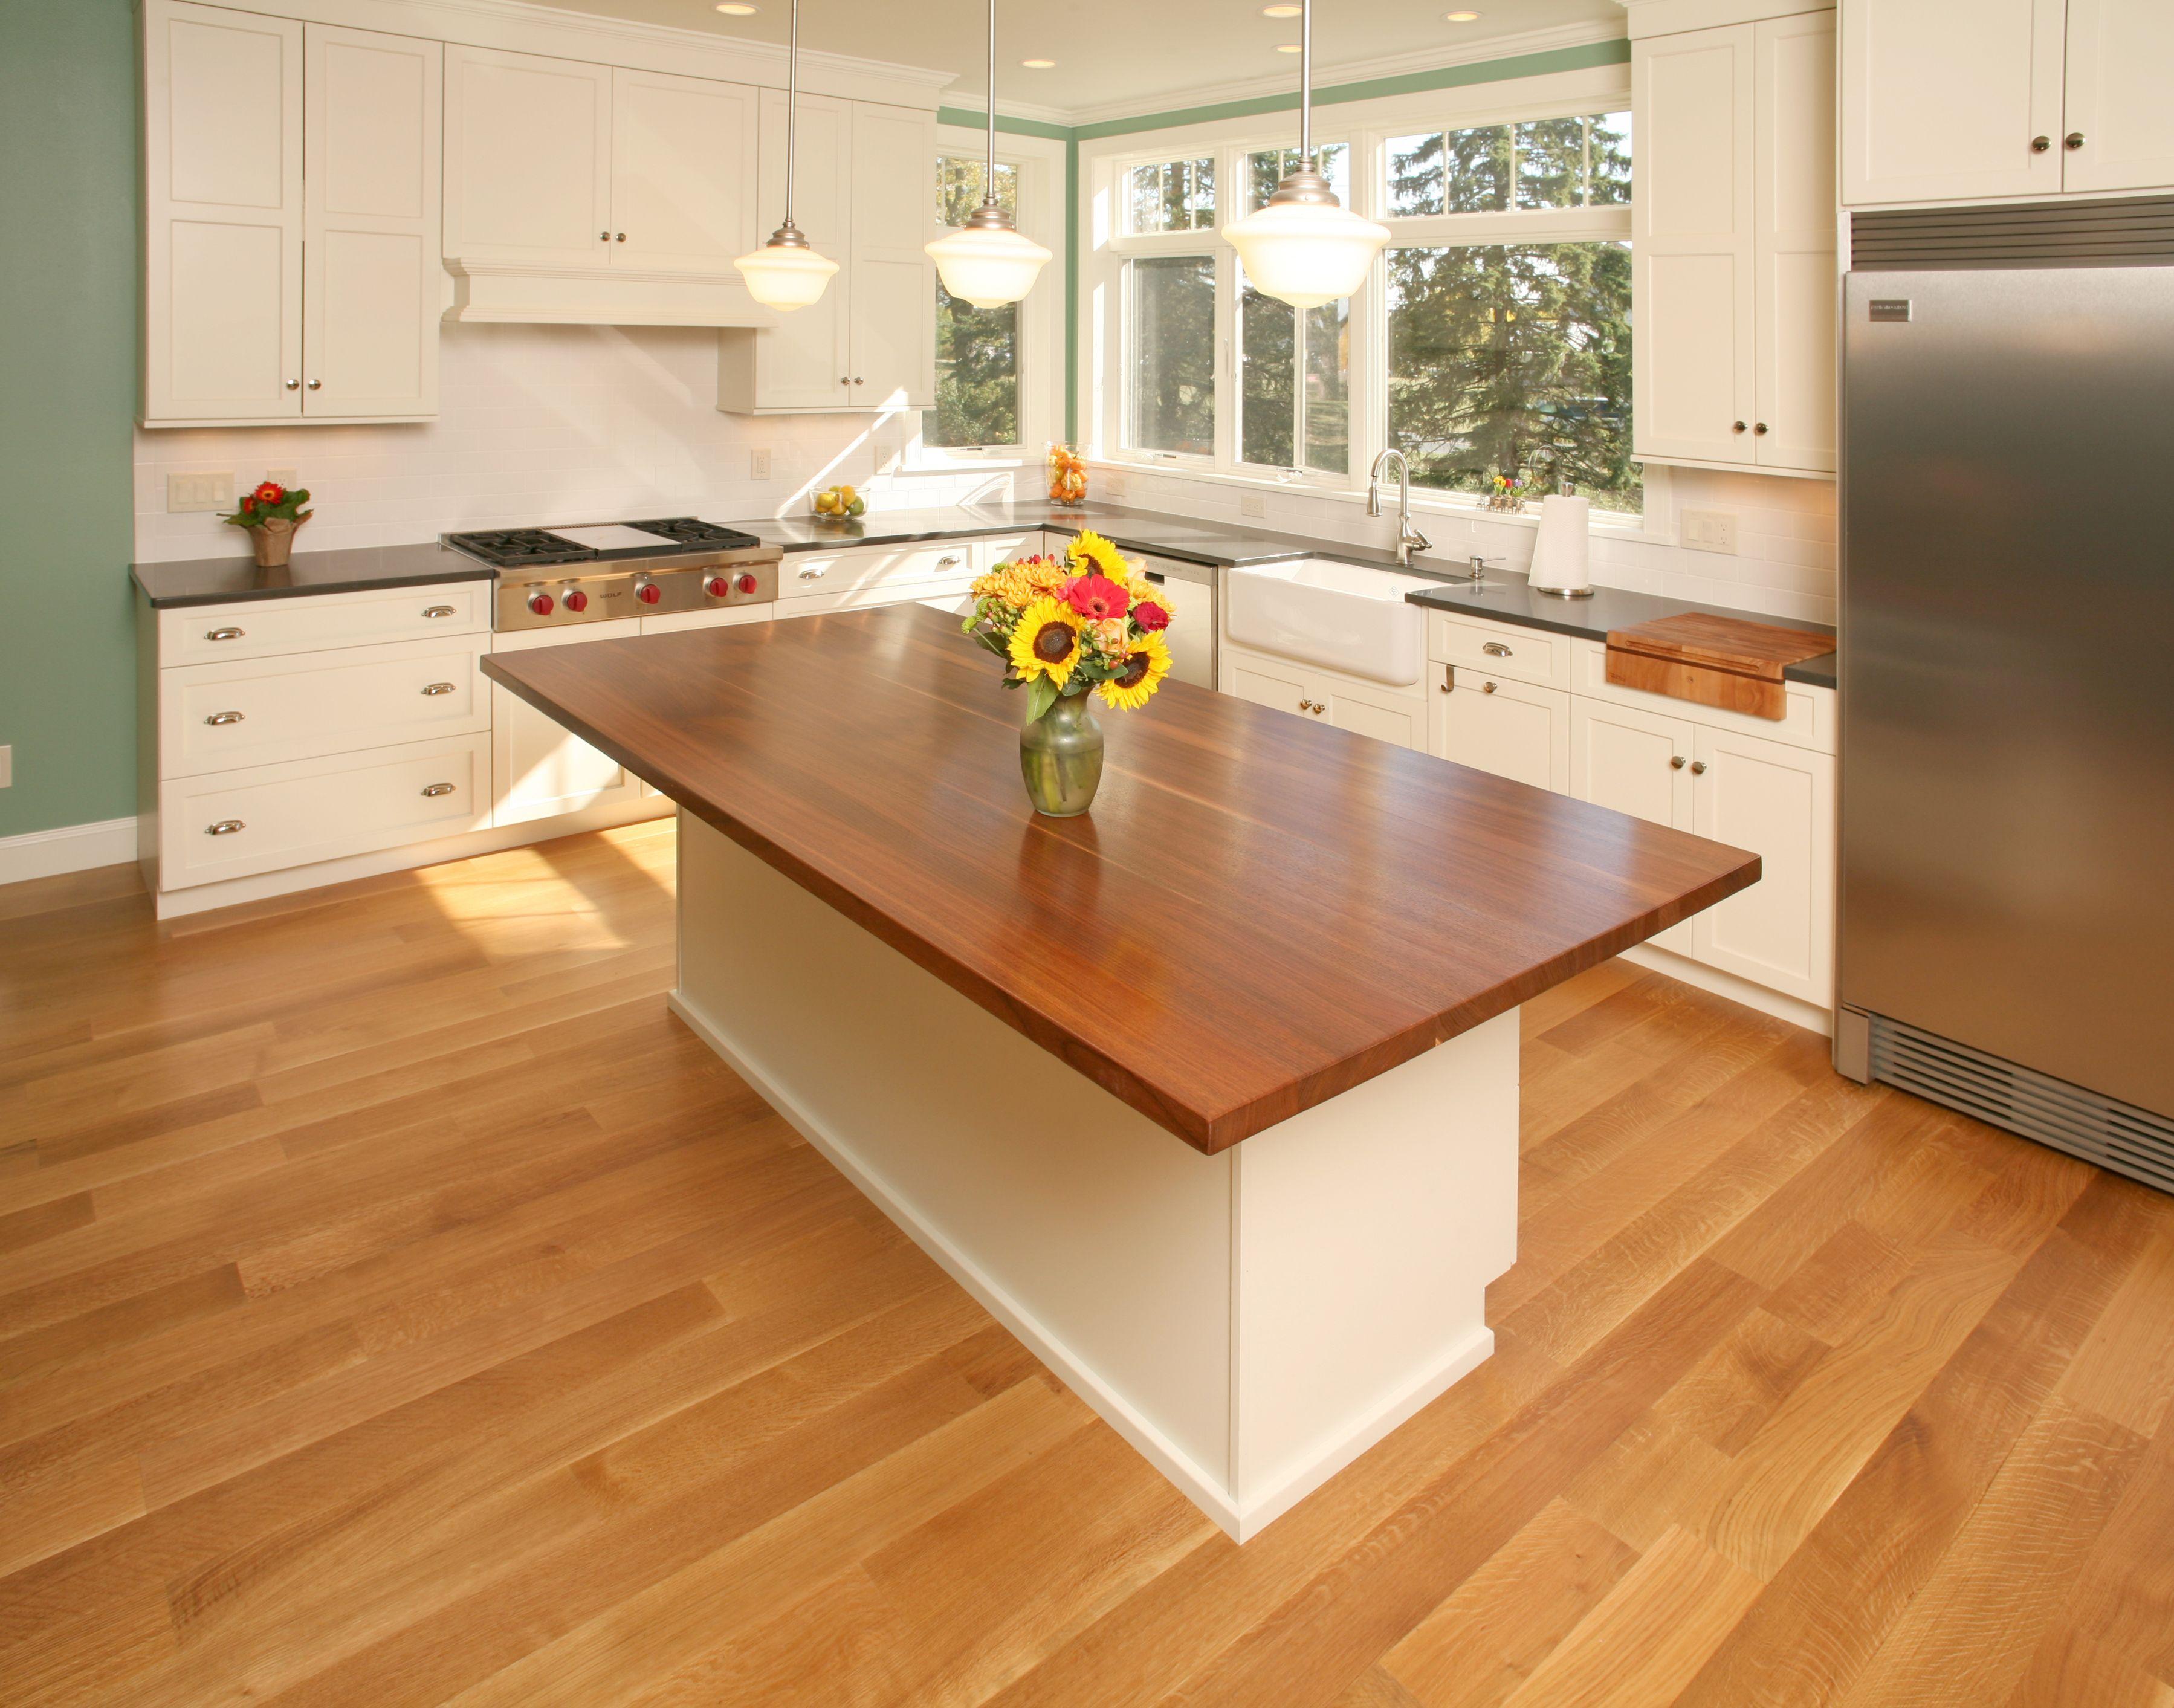 Craftsman Style Home By Madison Wi Residential Designer Udvari Solner Design Company Kitchen